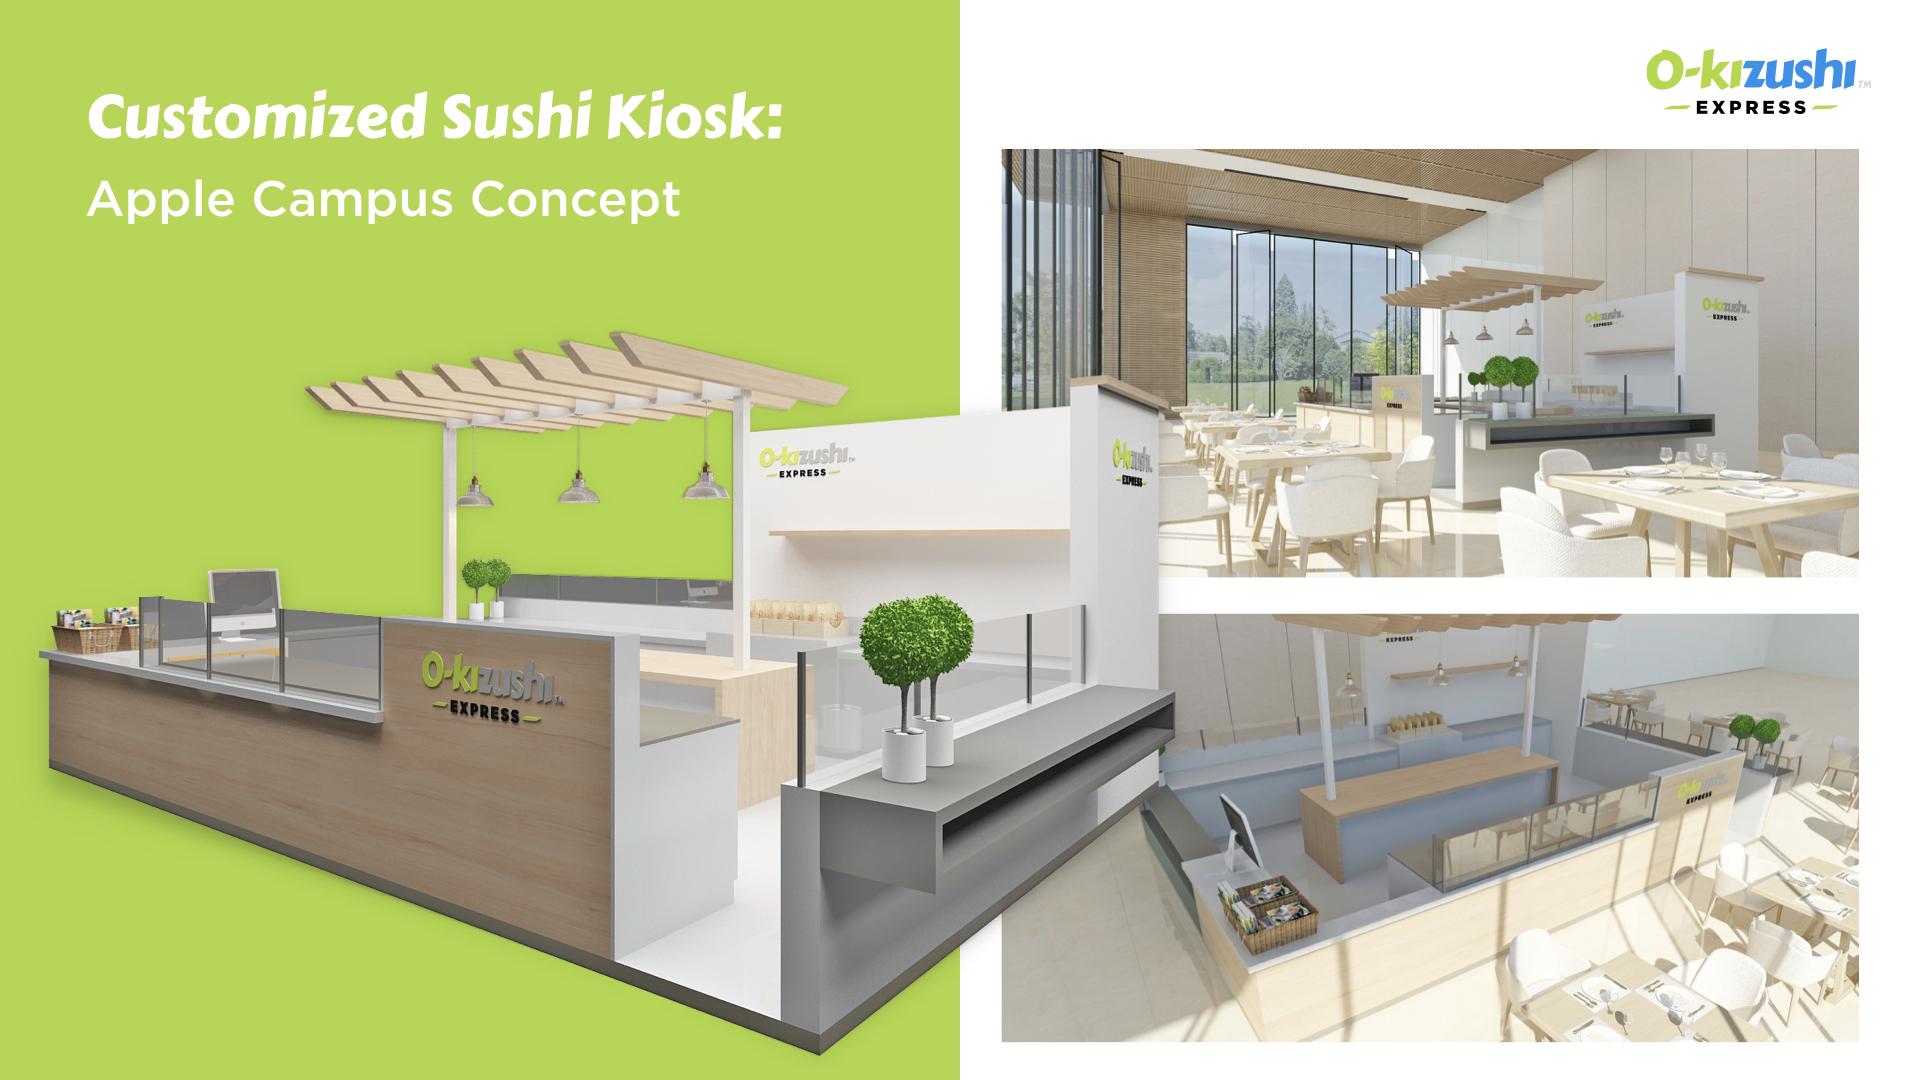 o-kizushi-proposal-generic01.012.jpeg